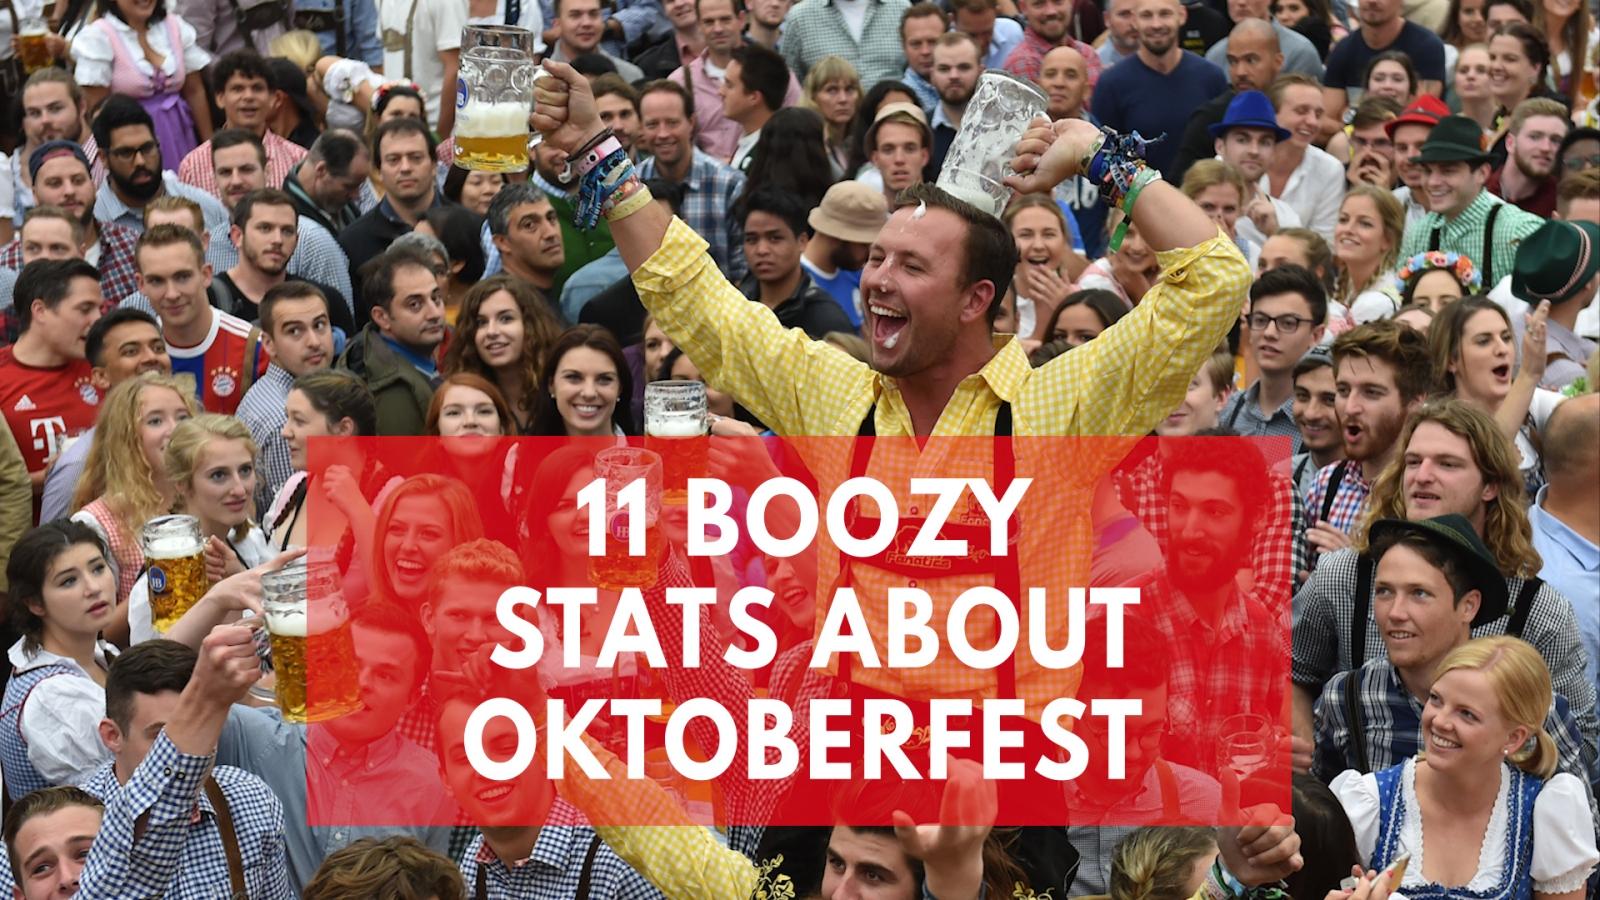 11-boozy-stats-about-oktoberfest